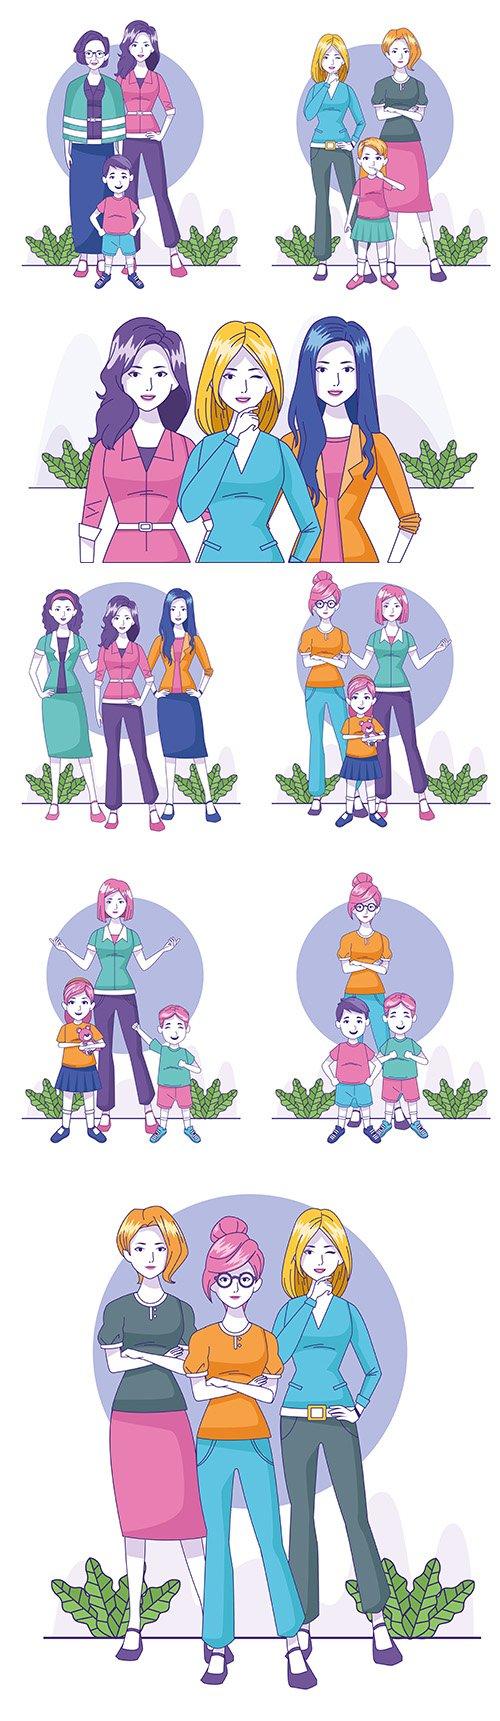 Women in fashion cartoon and small children